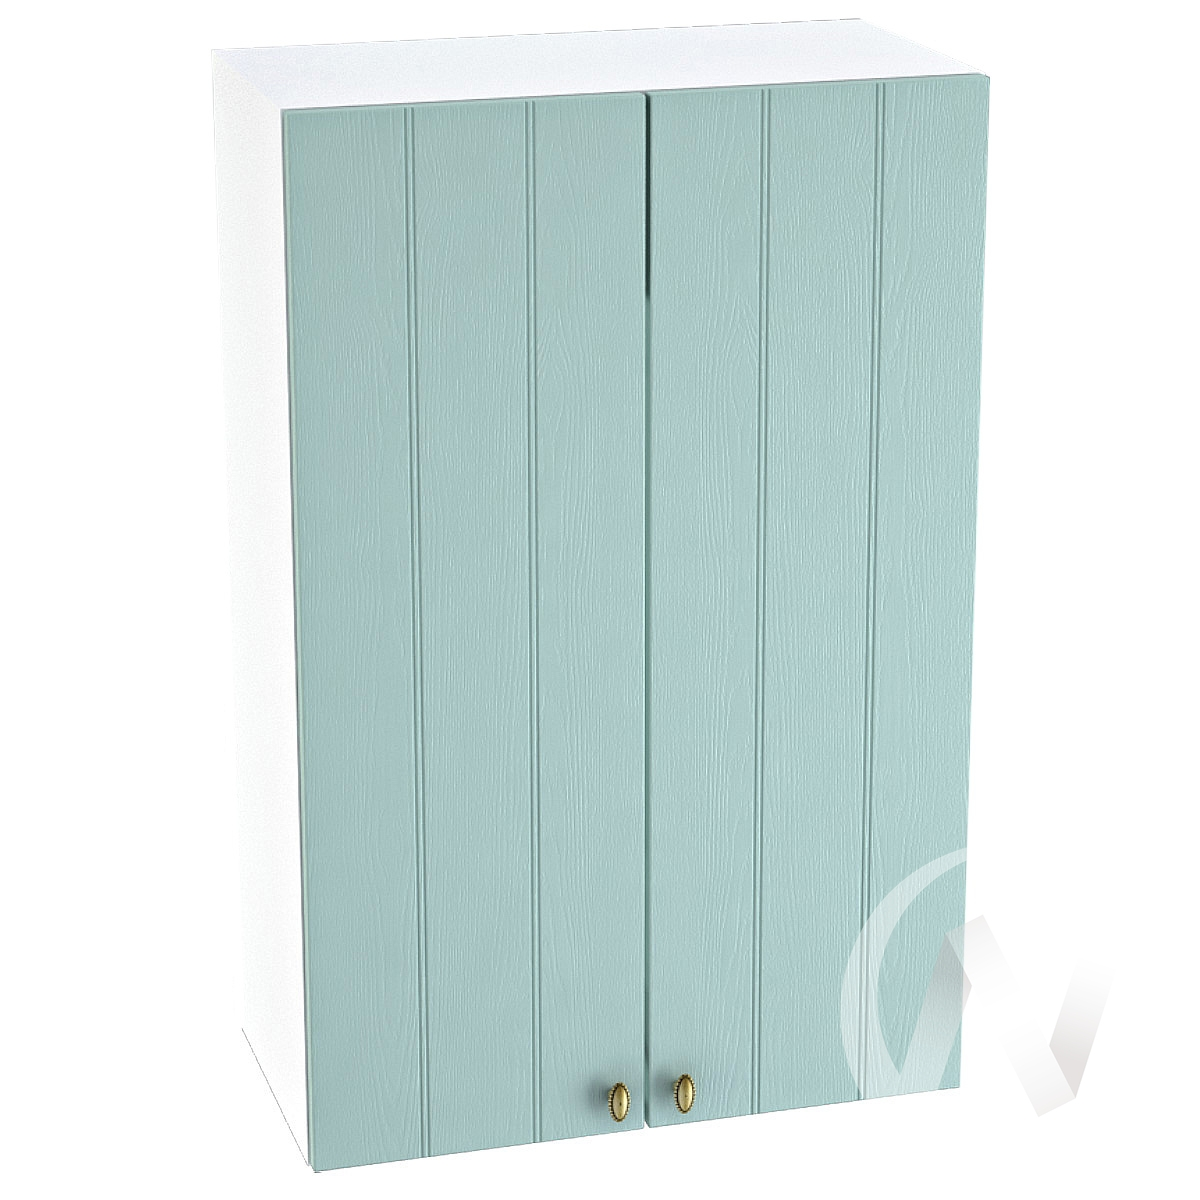 "Кухня ""Прованс"": Шкаф верхний 609, ШВ 609 (голубой/корпус белый)"